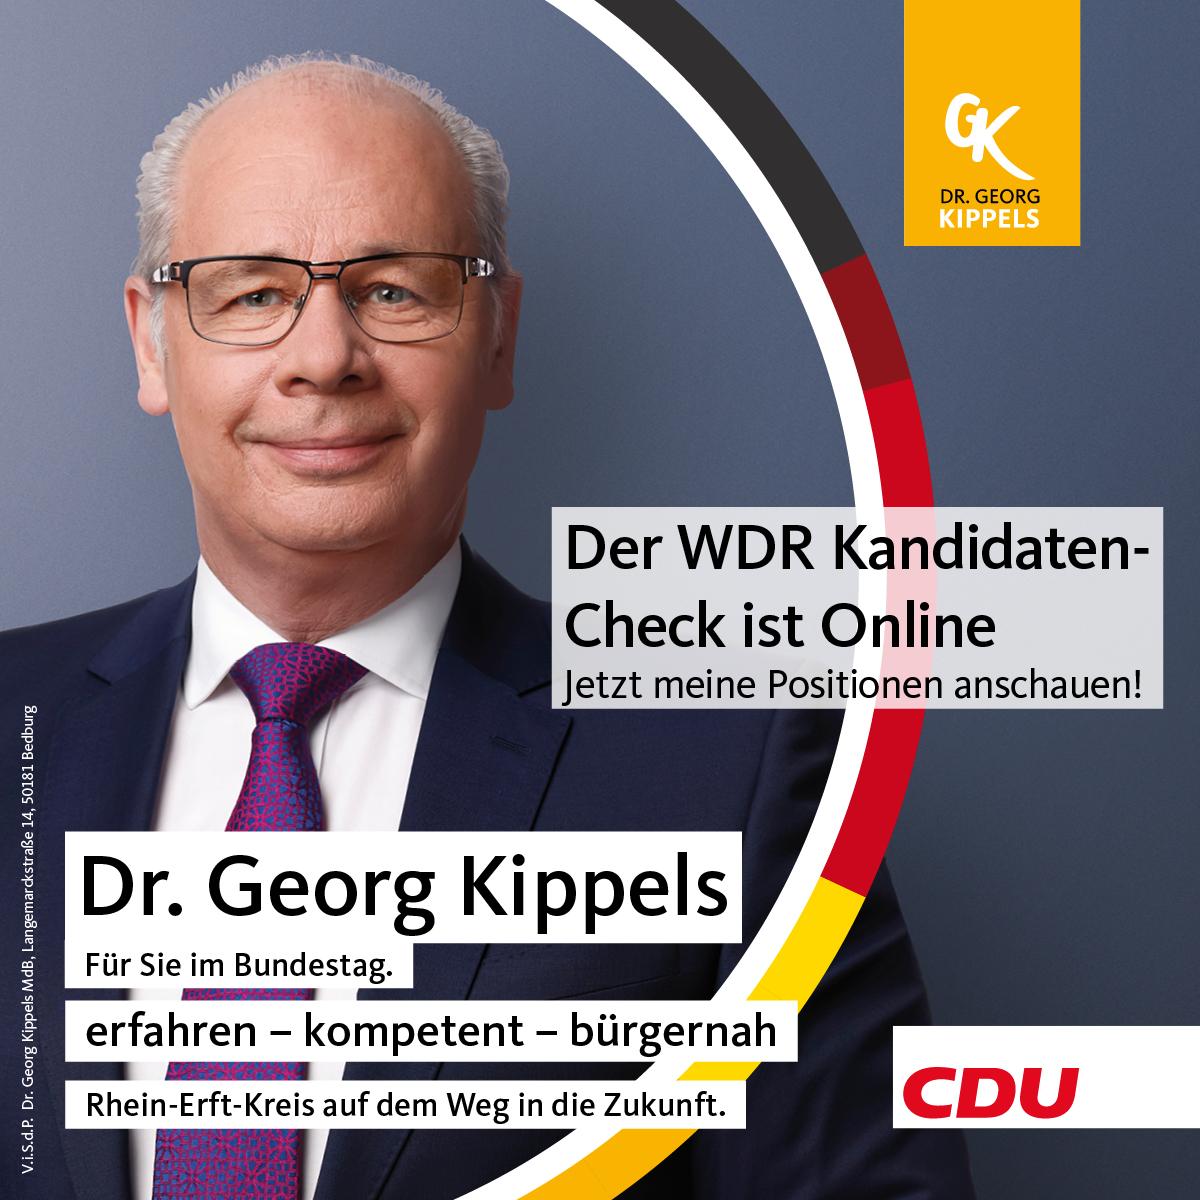 210813_WDR-Kandidatencheck_1200x1200_fb_ig